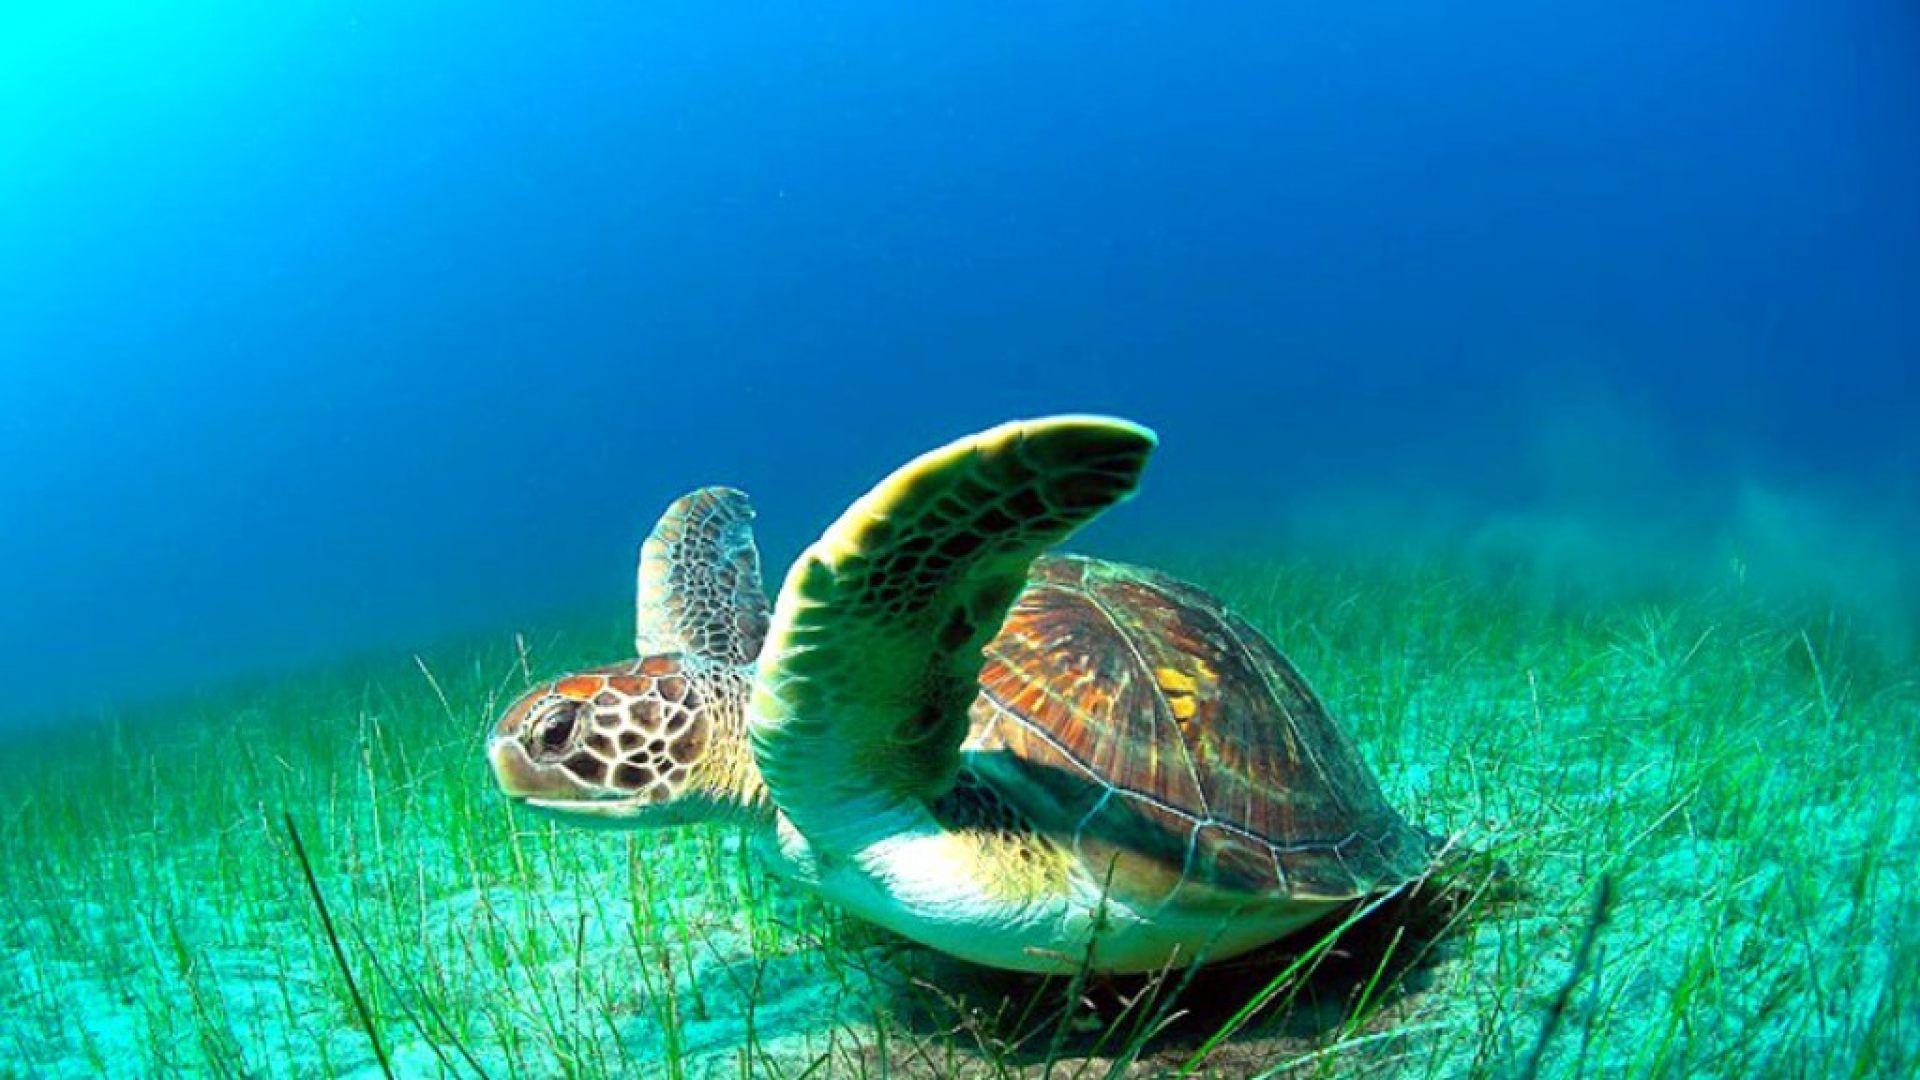 tortuga marina wallpapers - Buscar con Google